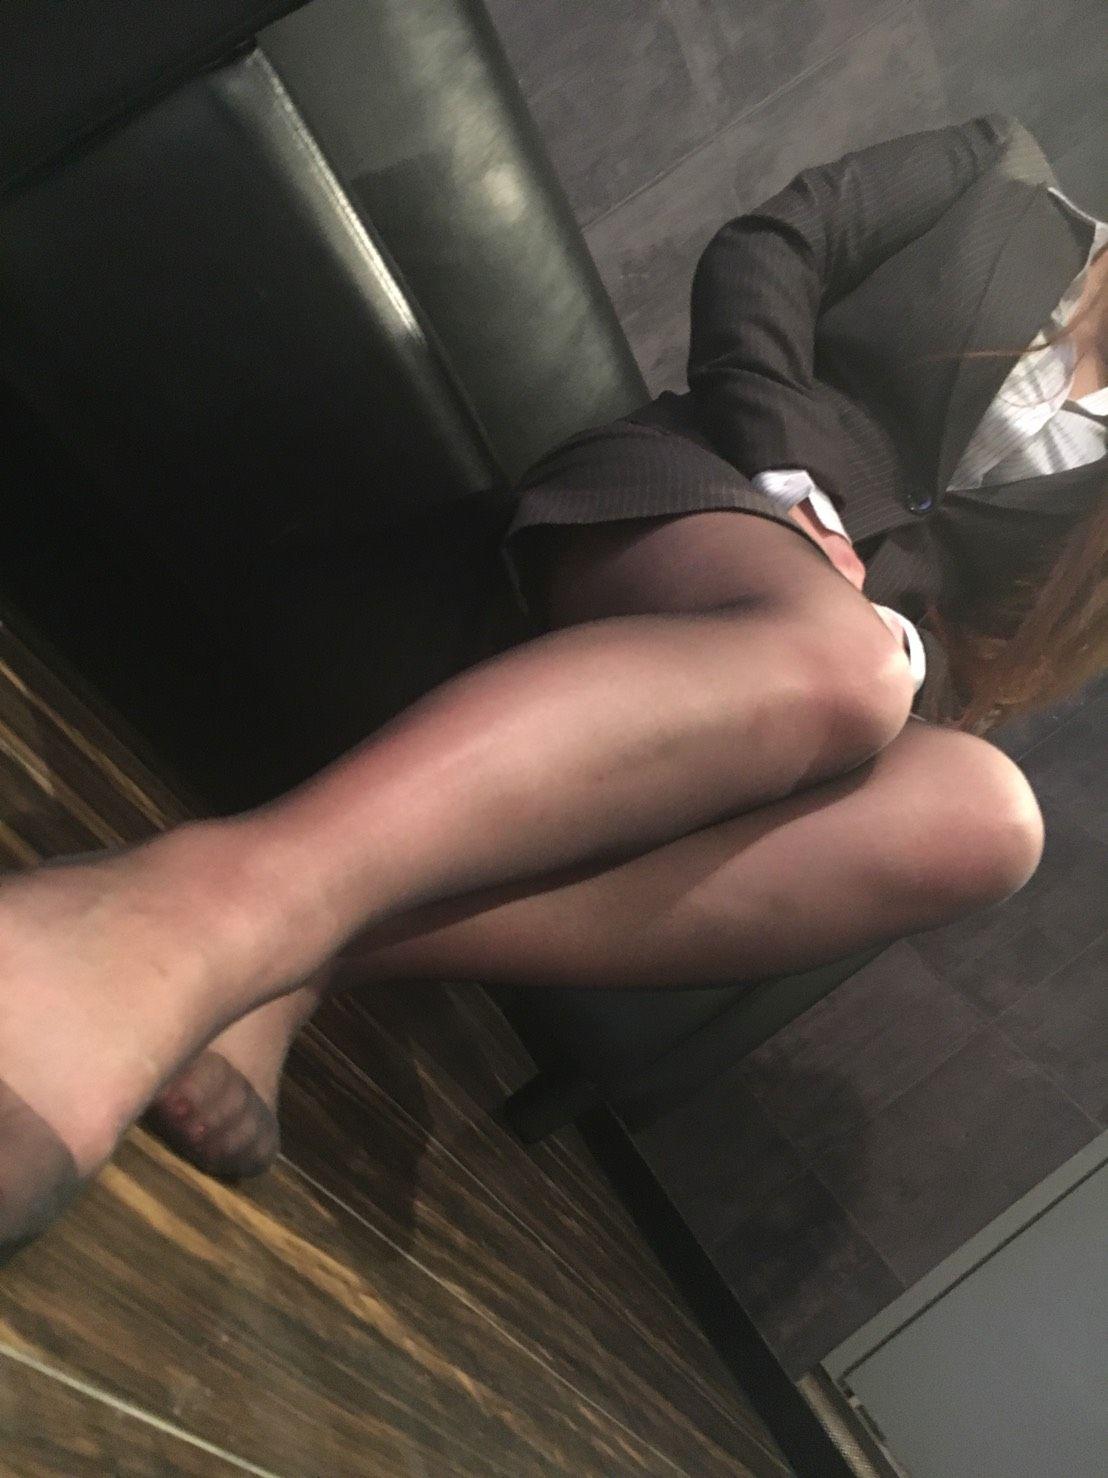 S__13918241